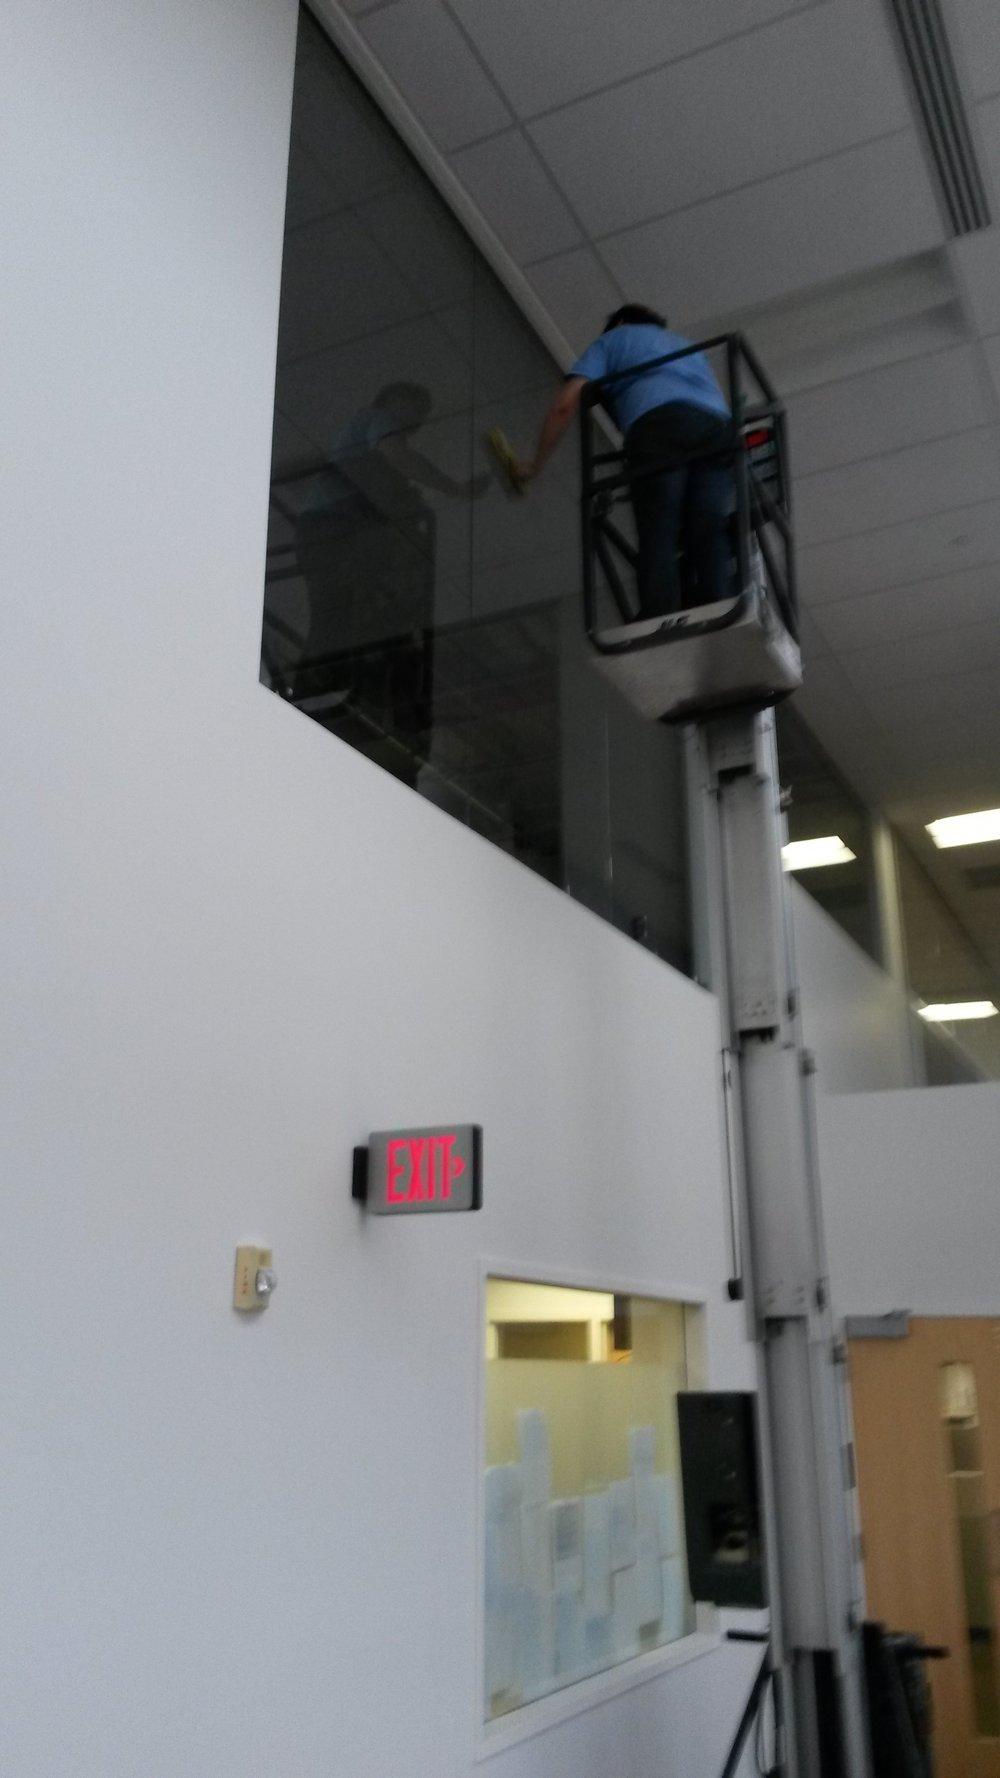 lift-cleaning1.jpg